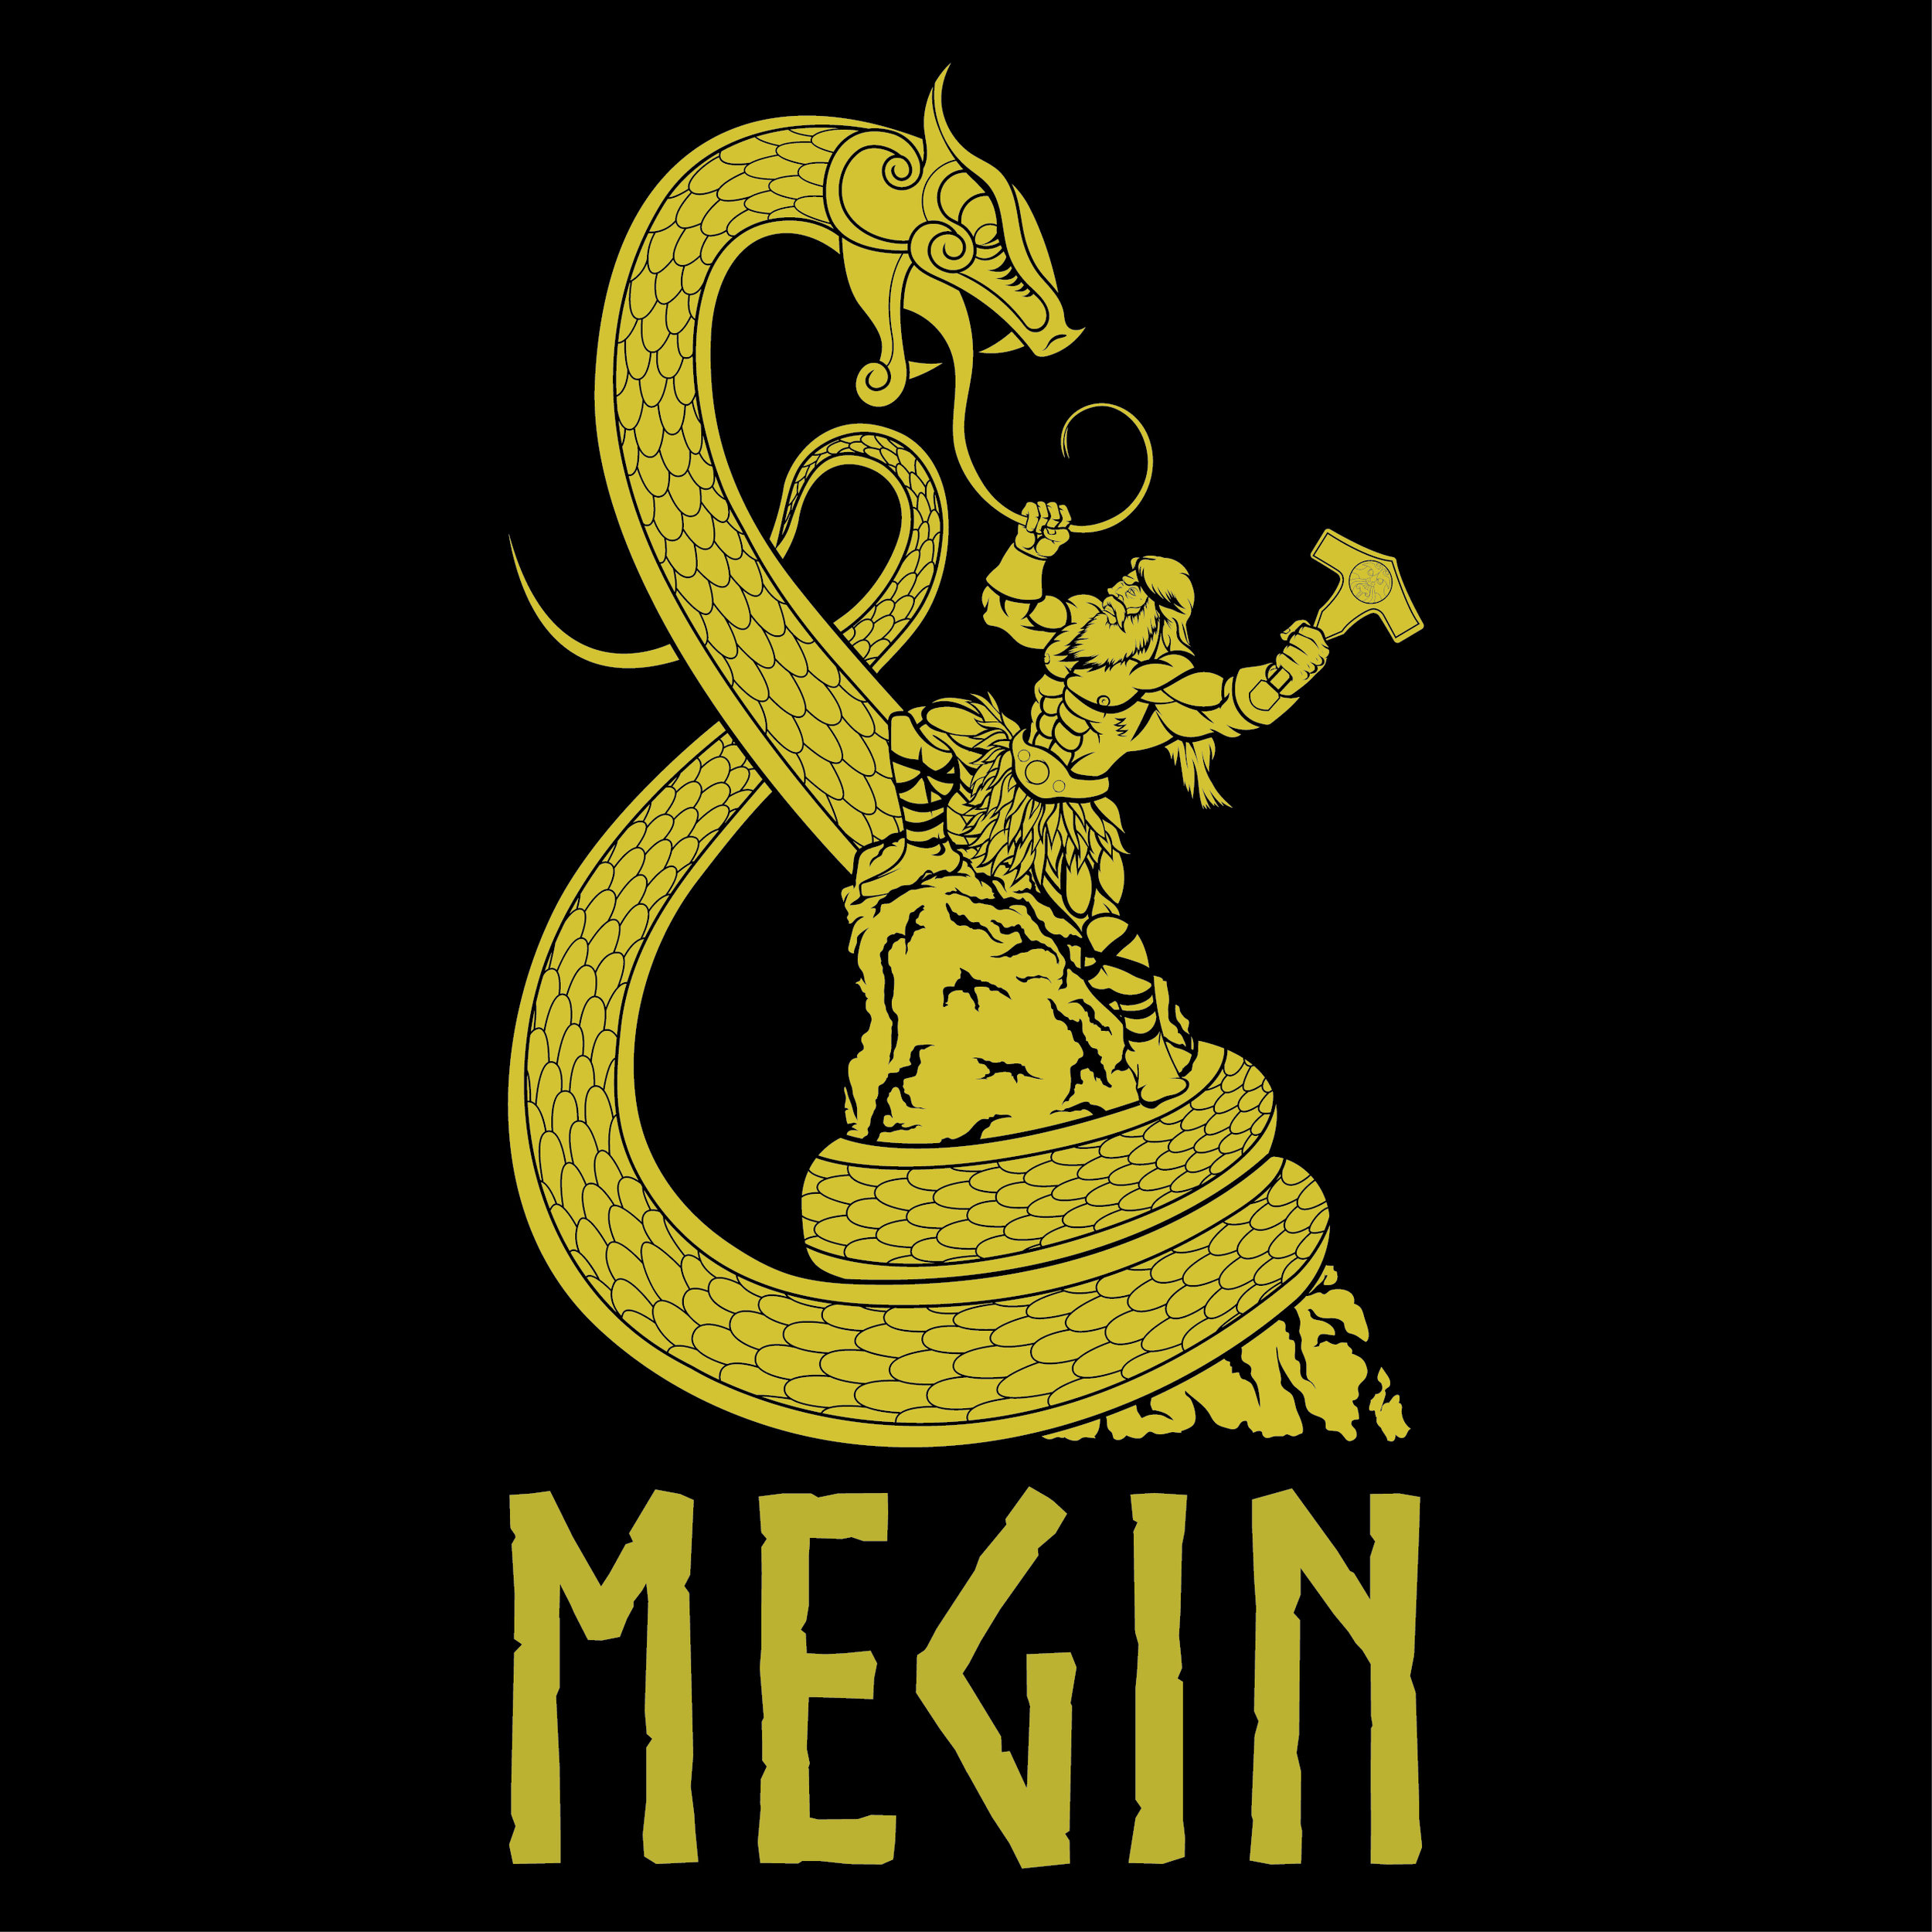 raskolapparel-raskol-apparel-thor-megin-nordic-norse-hero-mythos-mythology-epic-gym-gear-bodybuilding-shirt-power-gold-black-orozco-design-roberto-orozcodesign-artist-vector-thorhammer.jpg